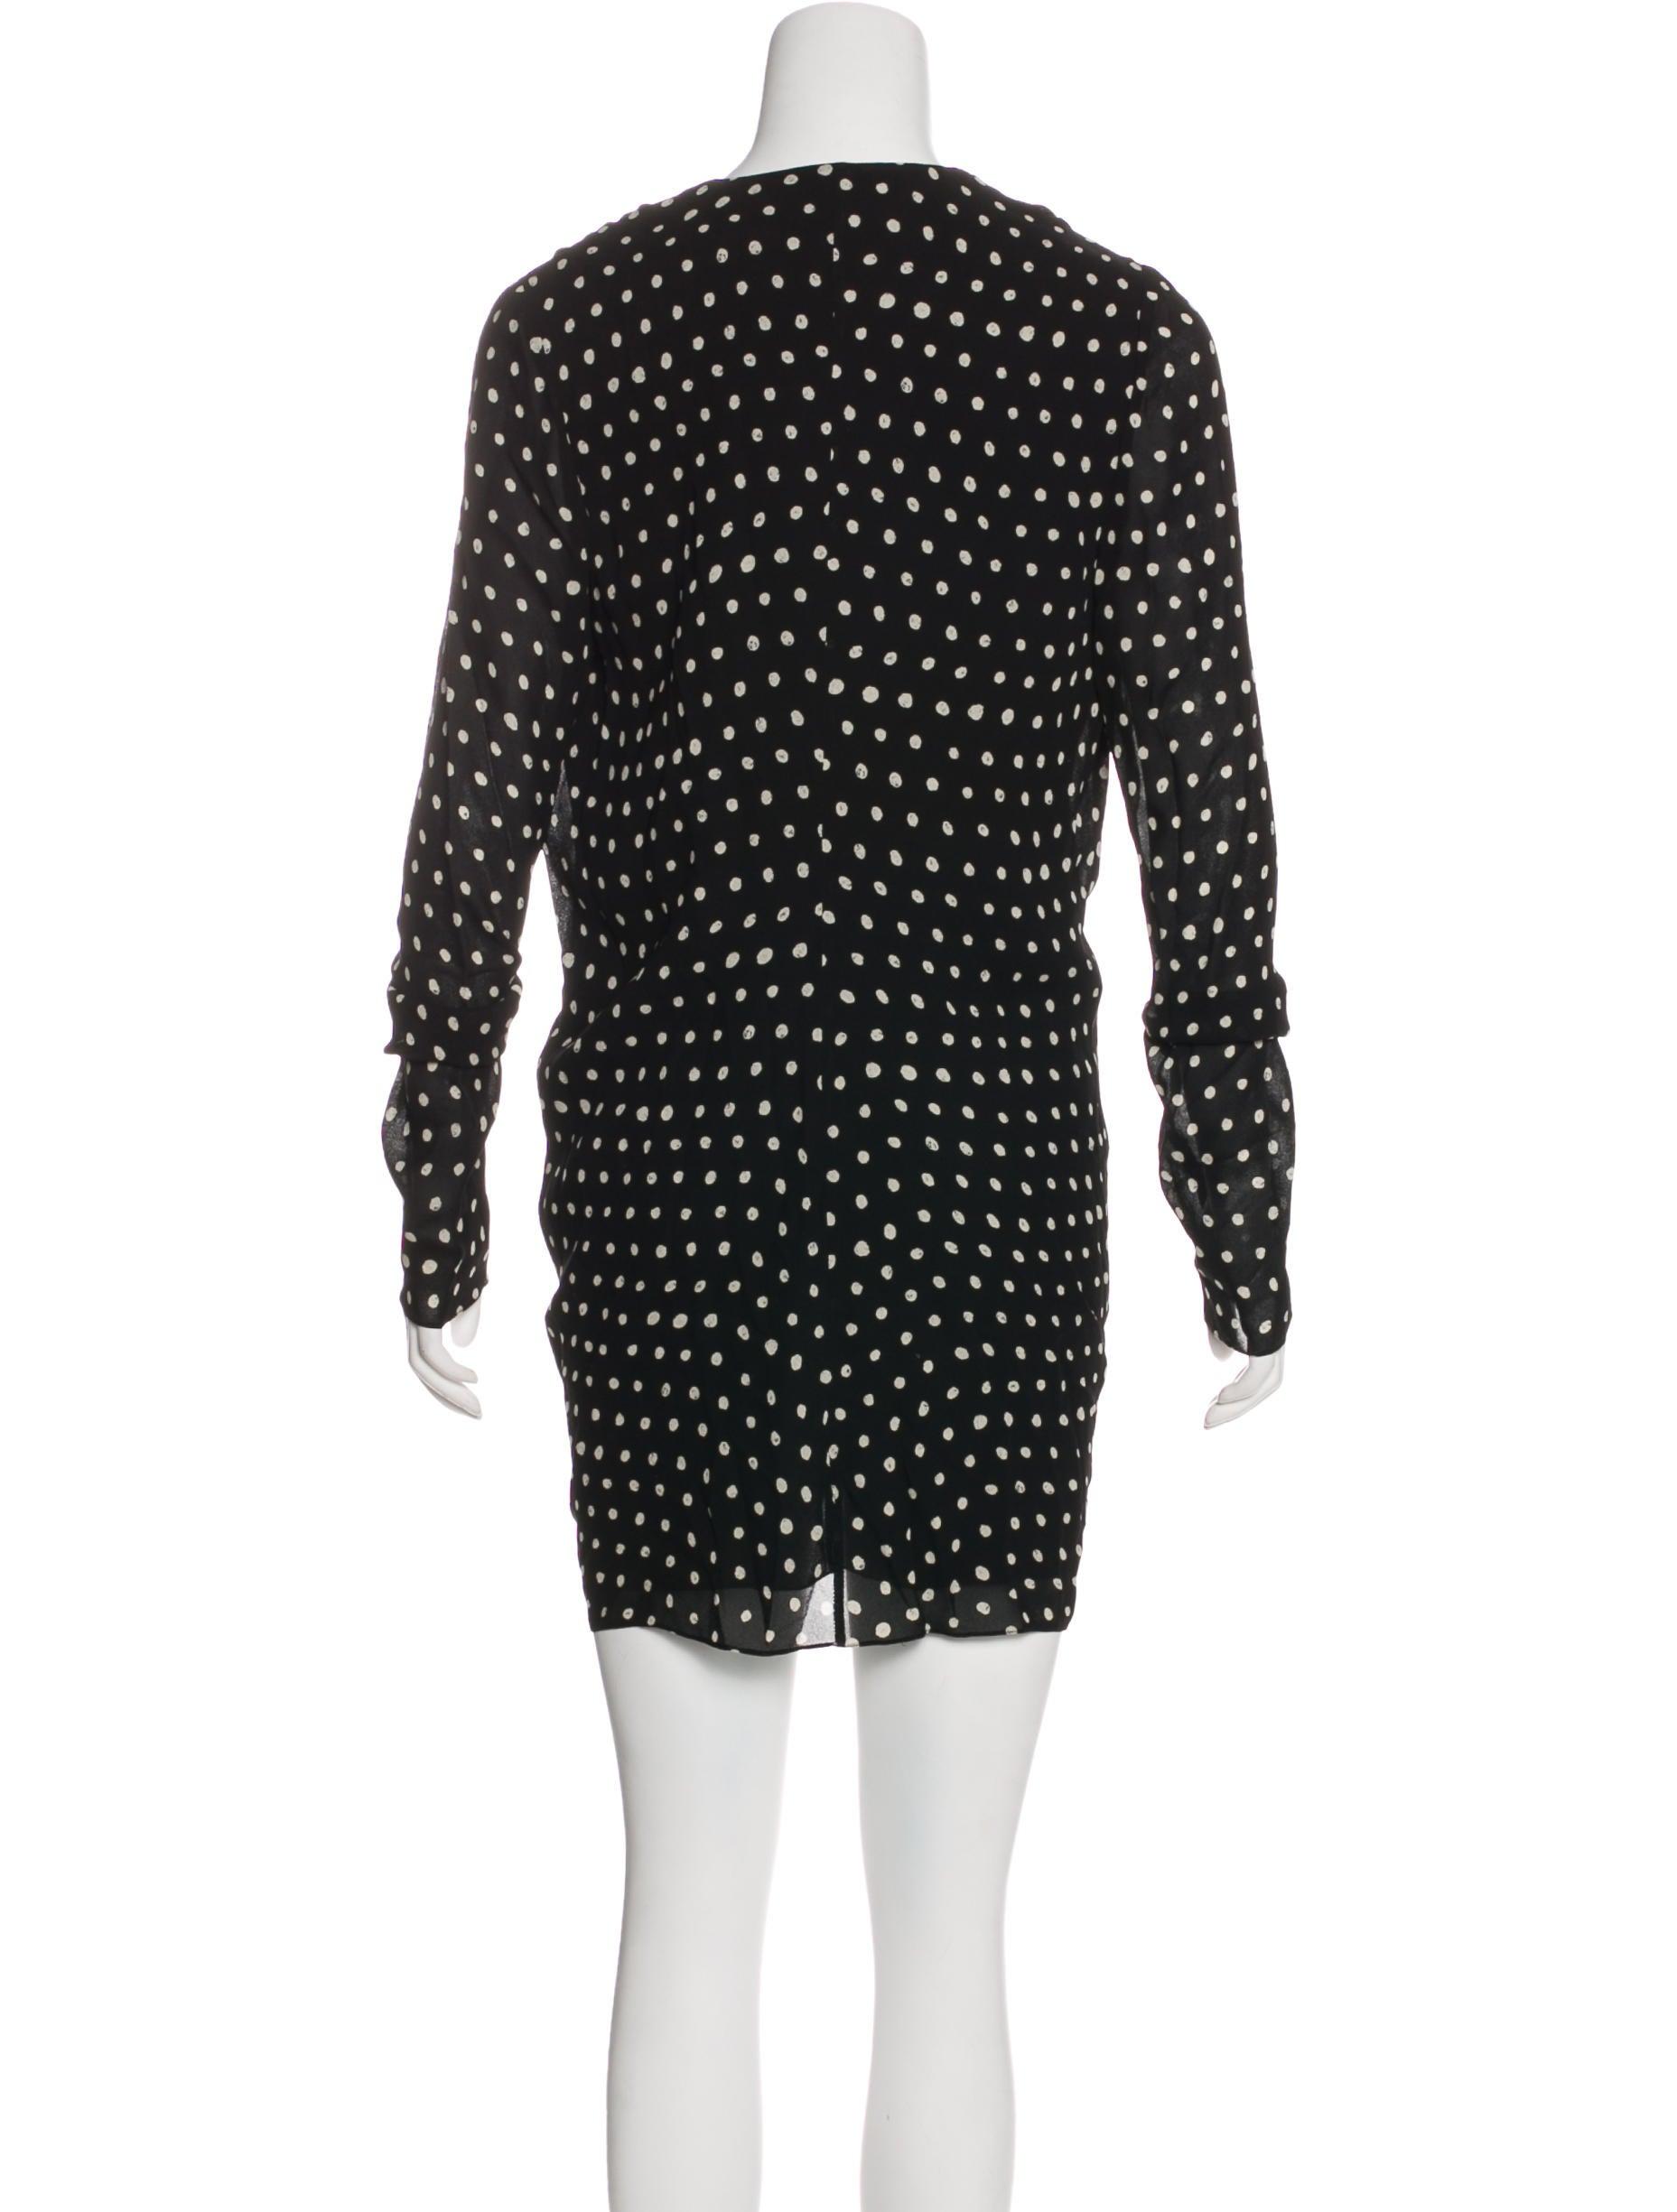 04f0086c43 Saint Laurent 2018 Polka Dot Dress w  Tags - Clothing - SNT45916 ...